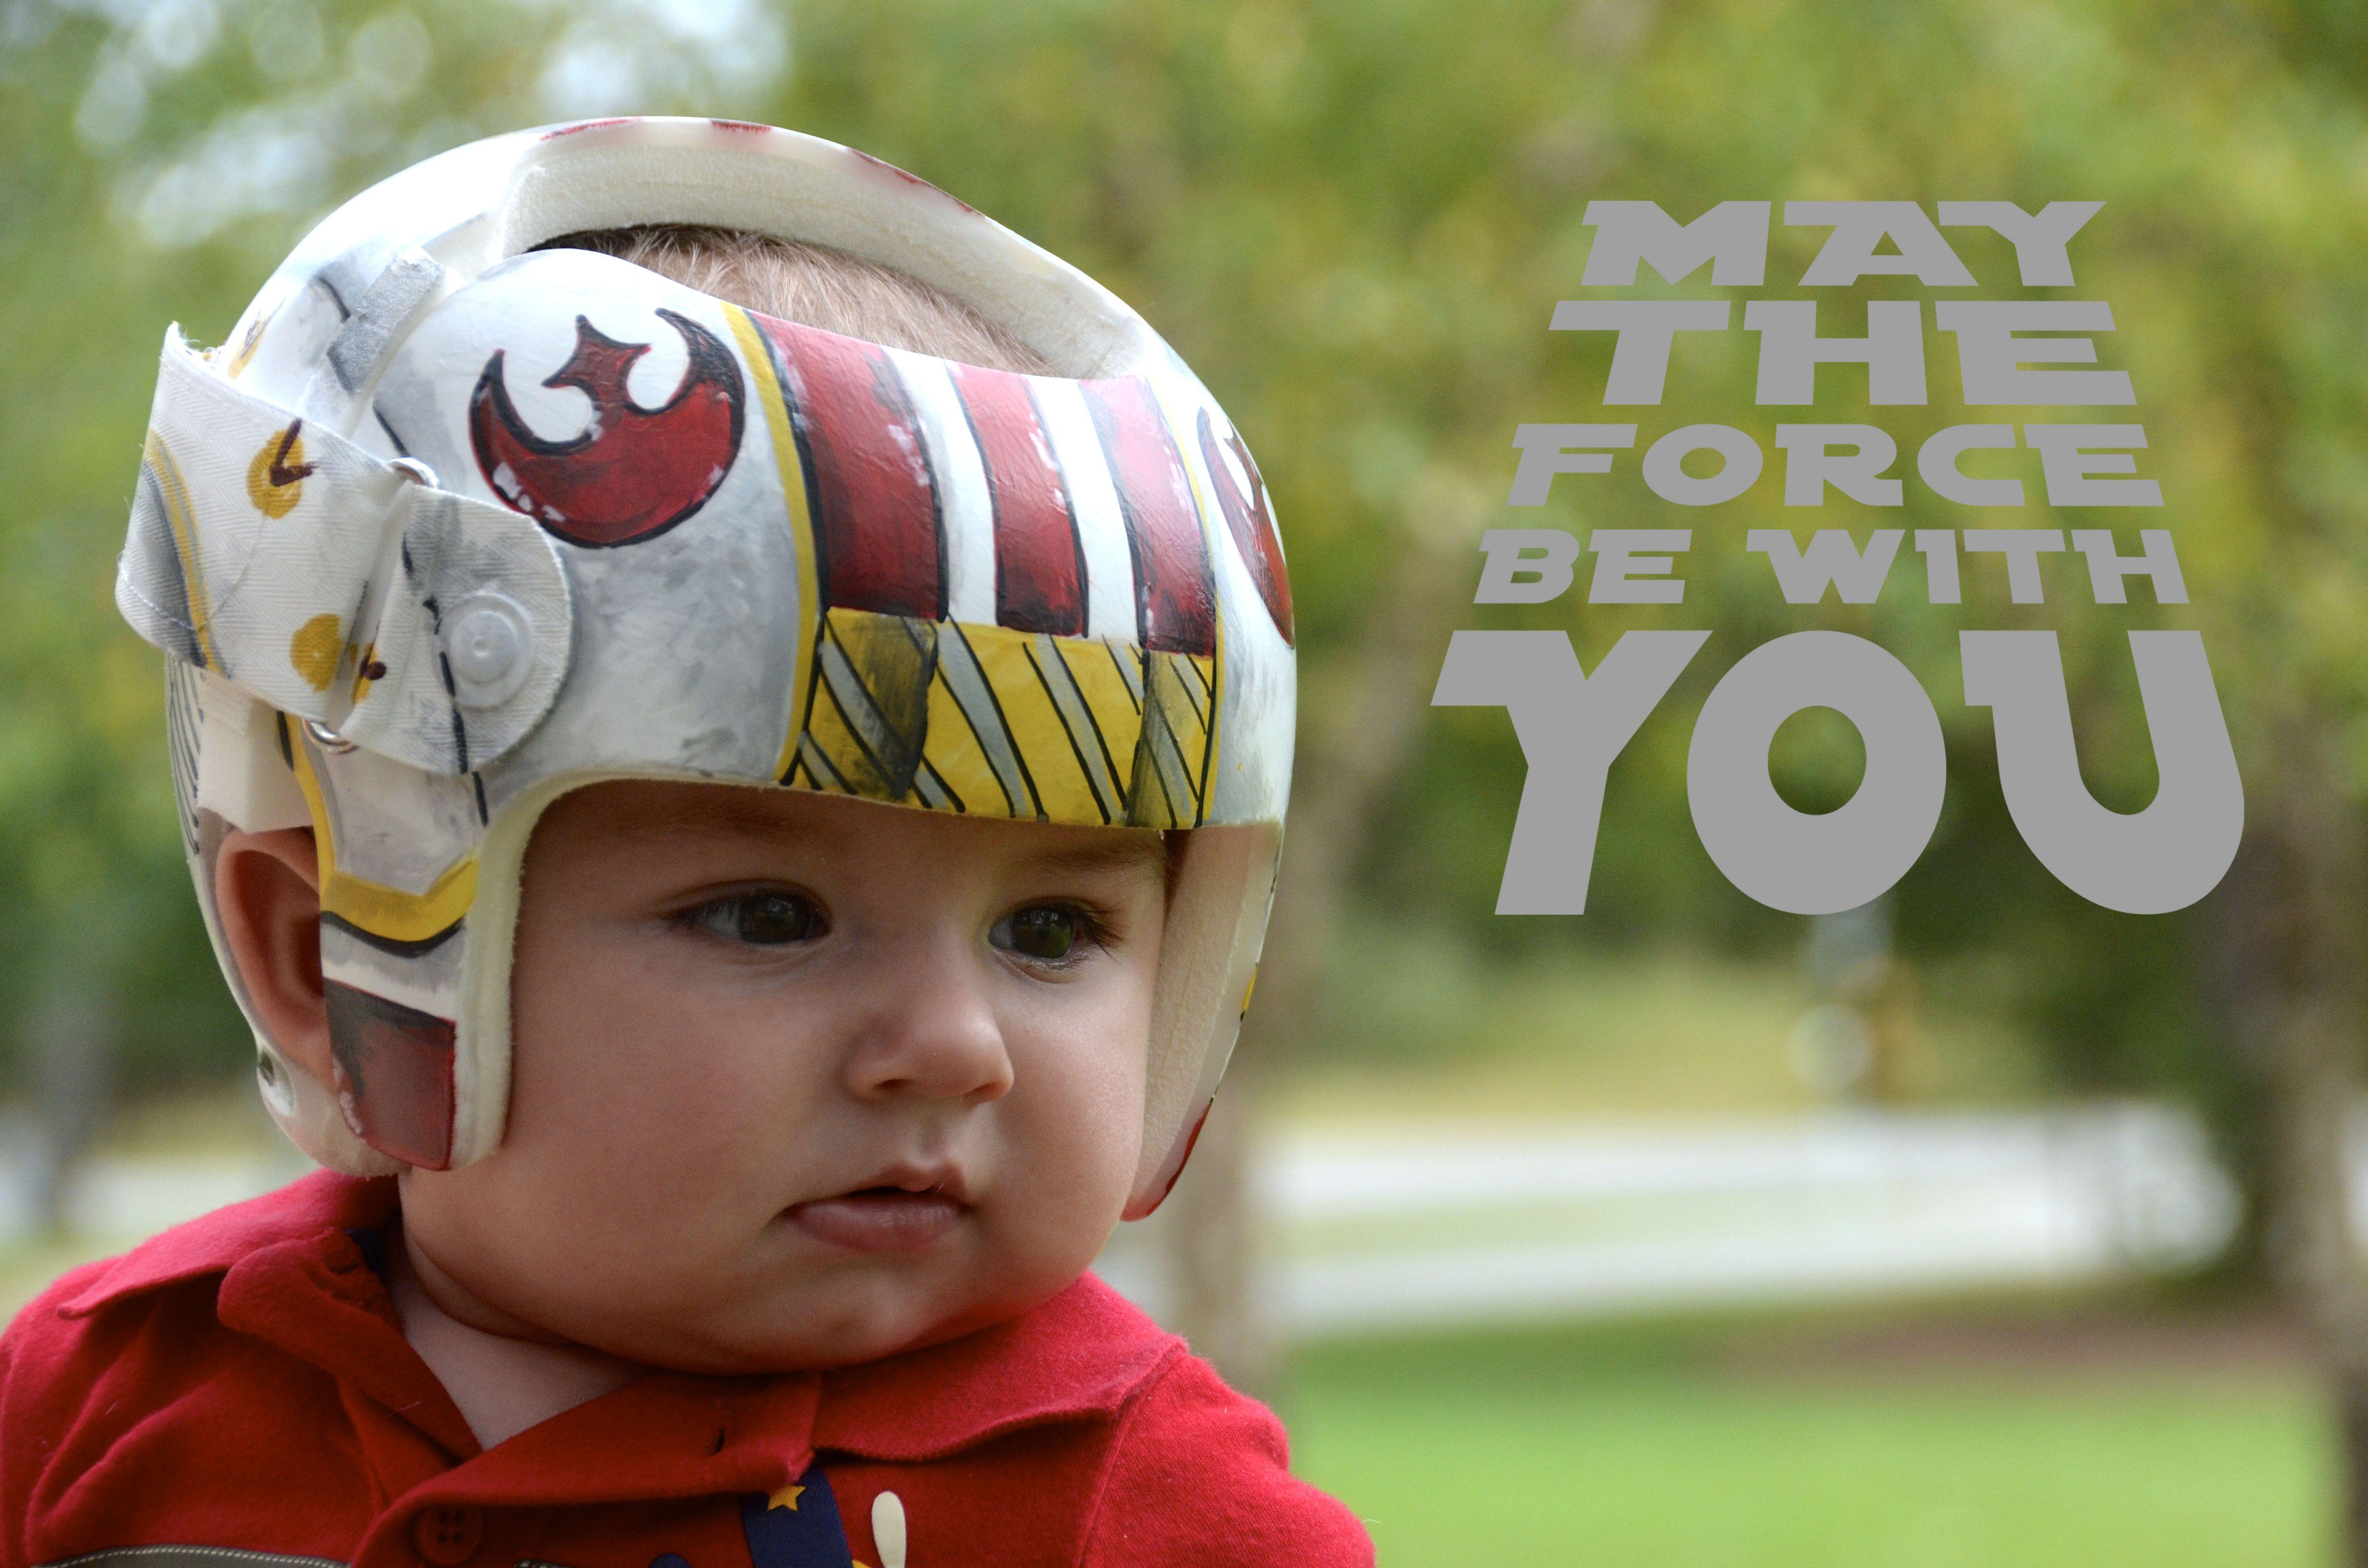 X Wing Fighter Helmet Star Wars Cranial Band Doc Helmet Https Www Facebook Com Pages Cranial Bandsmur Baby Helmet Baby Helmet Design Boys Baby Helmet Design